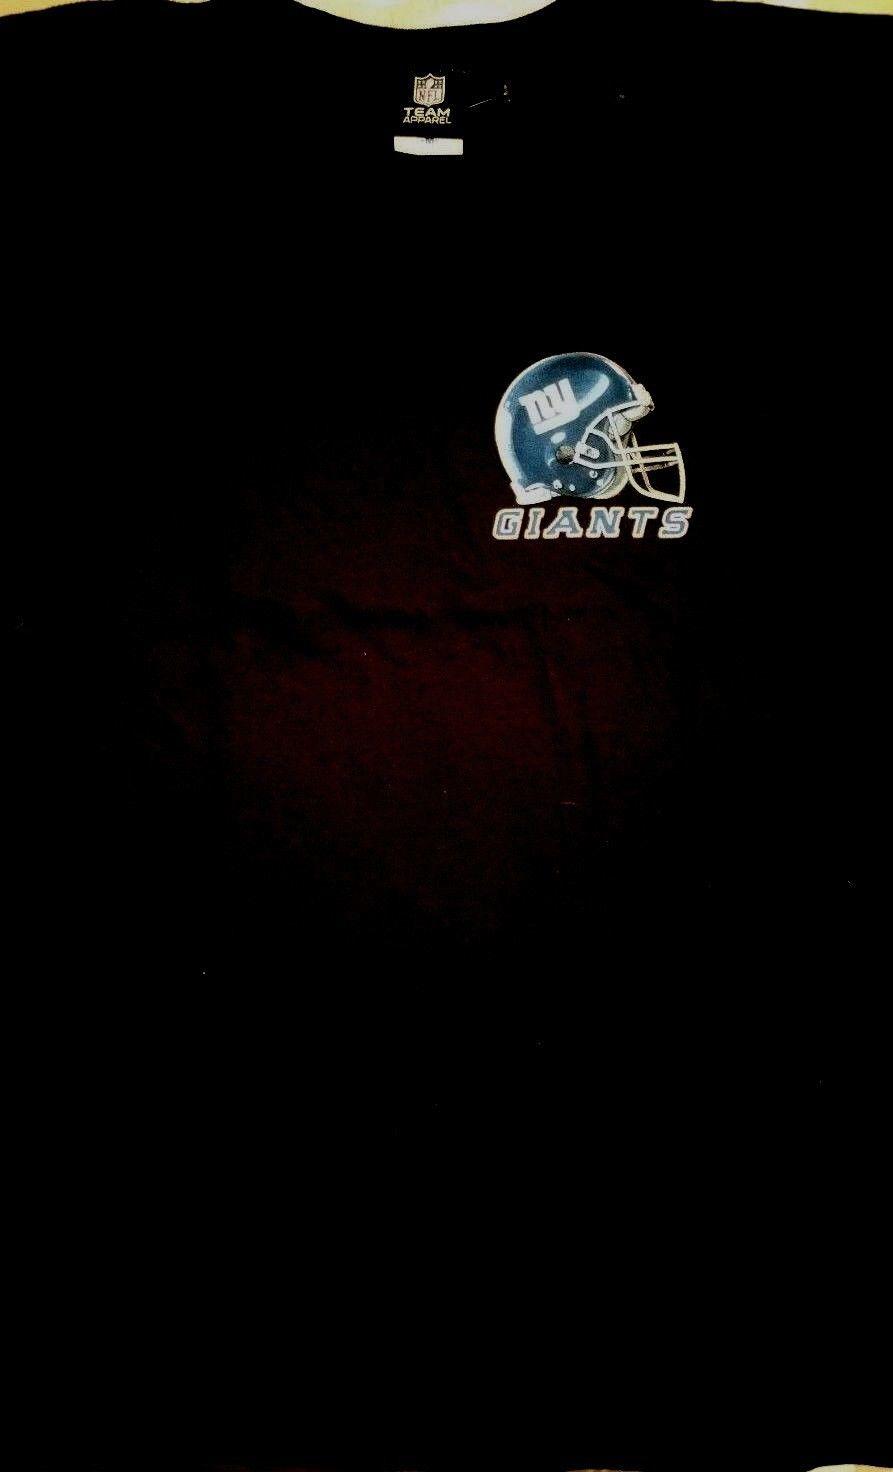 NEW YORK GIANTS   New with tags SKY HELMET T Shirt BLACK shirt NFL TEAM APPAREL image 2